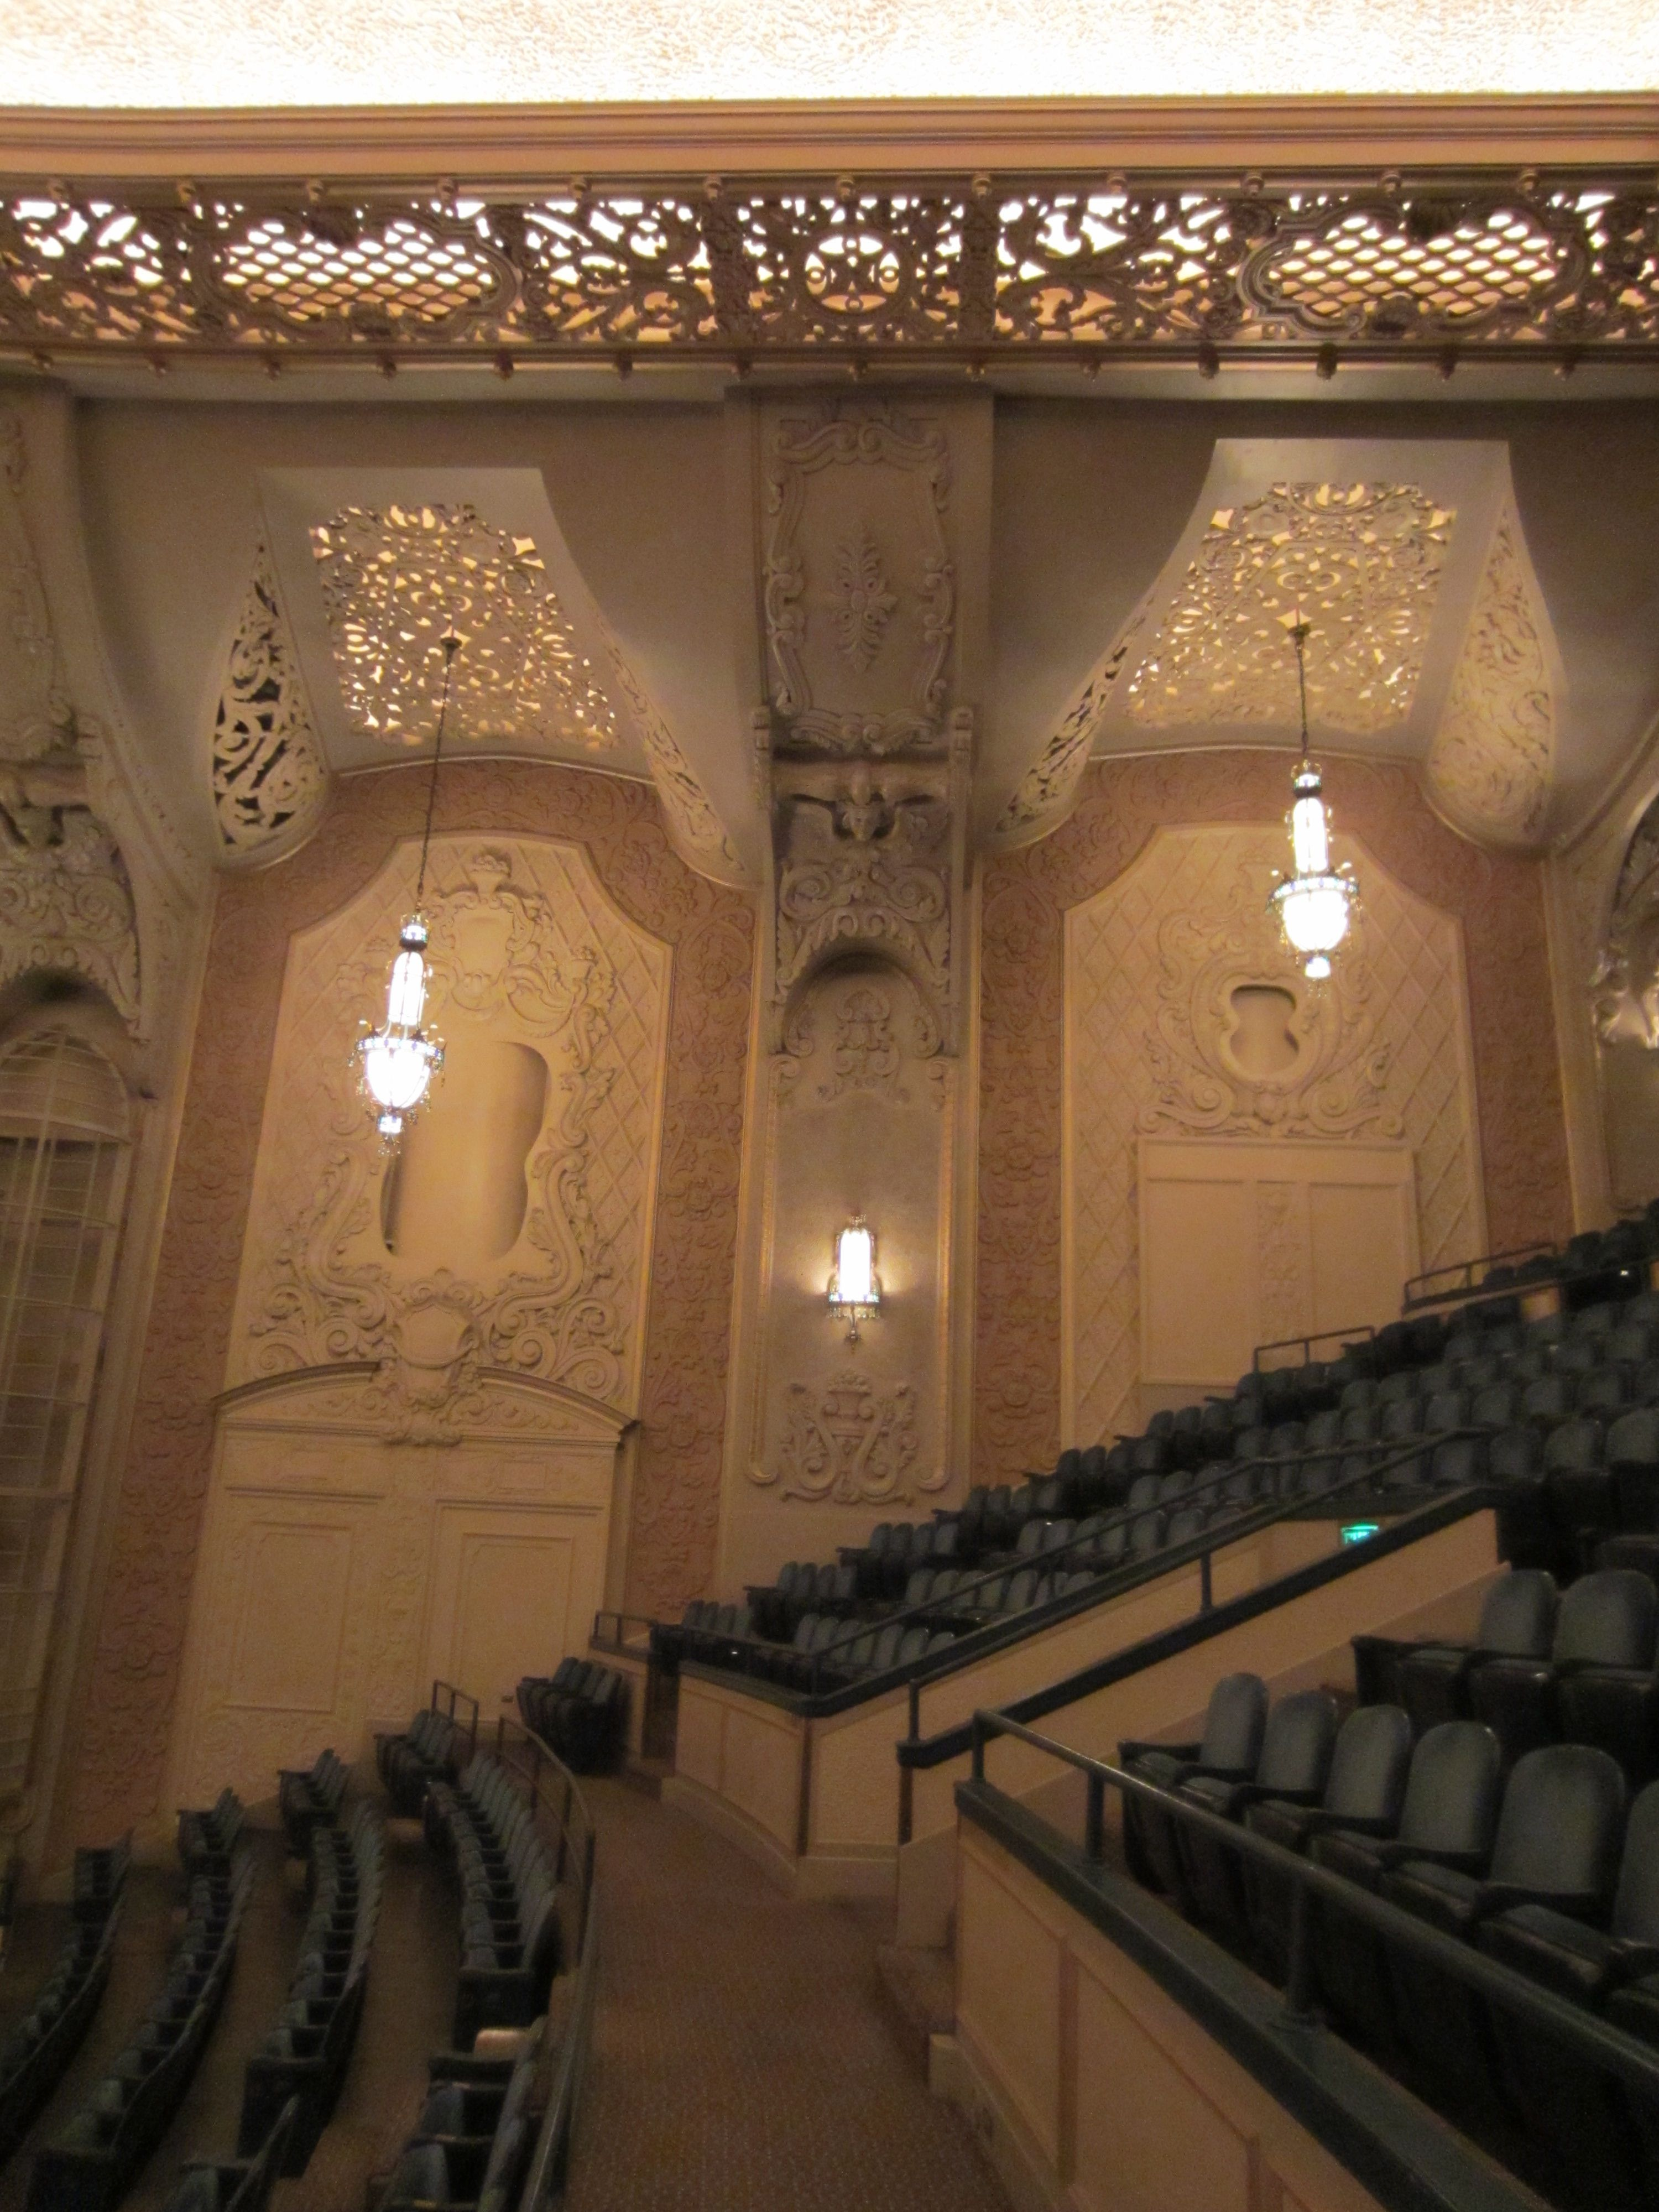 FileArlene Schnitzer Concert Hall SeatsJPG Wikimedia Commons - Schnitzer concert hall seating